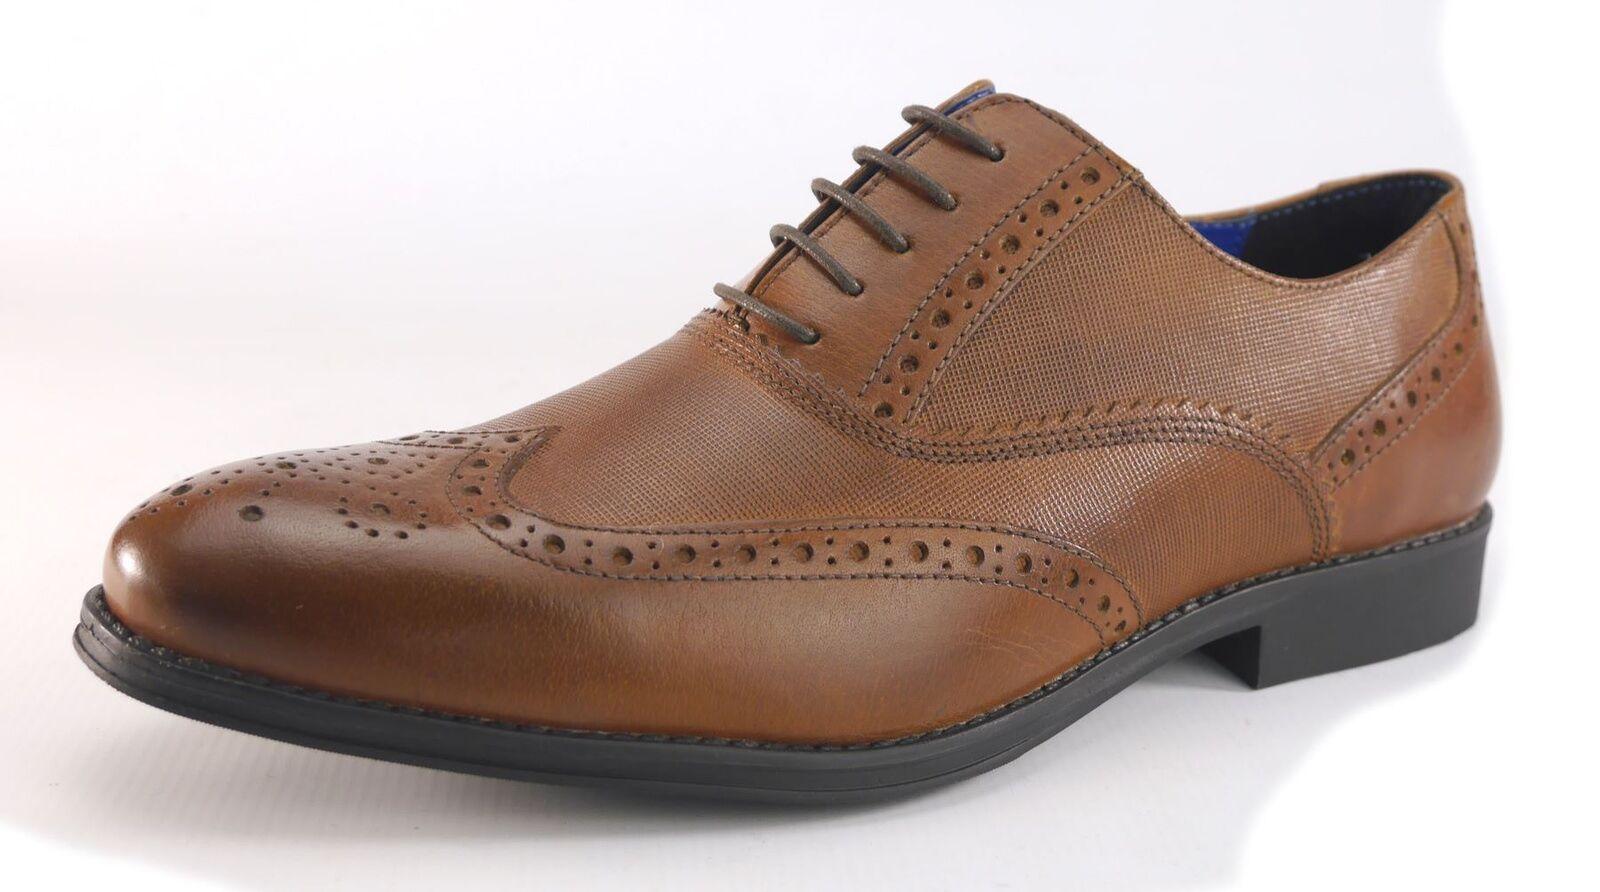 Rojo taoe Hombre Hombre Formal Brogue Cordones Zapatos Hombre Hombre Marrón 42091e